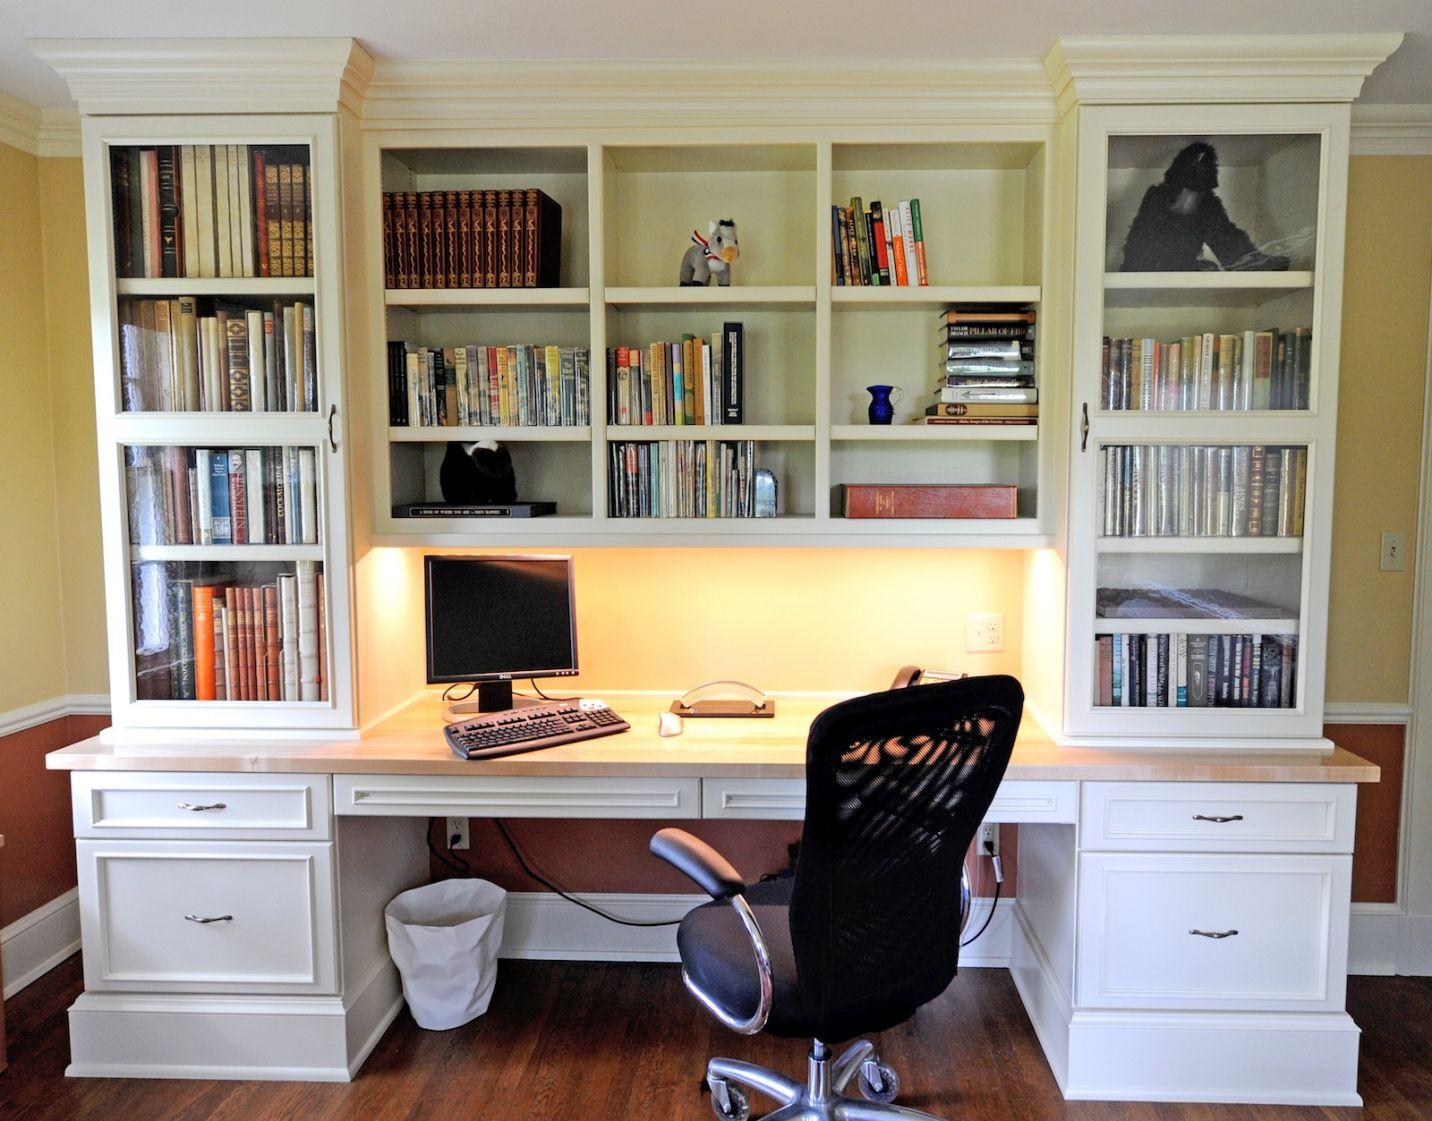 35+ Desk and bookshelf combo ideas